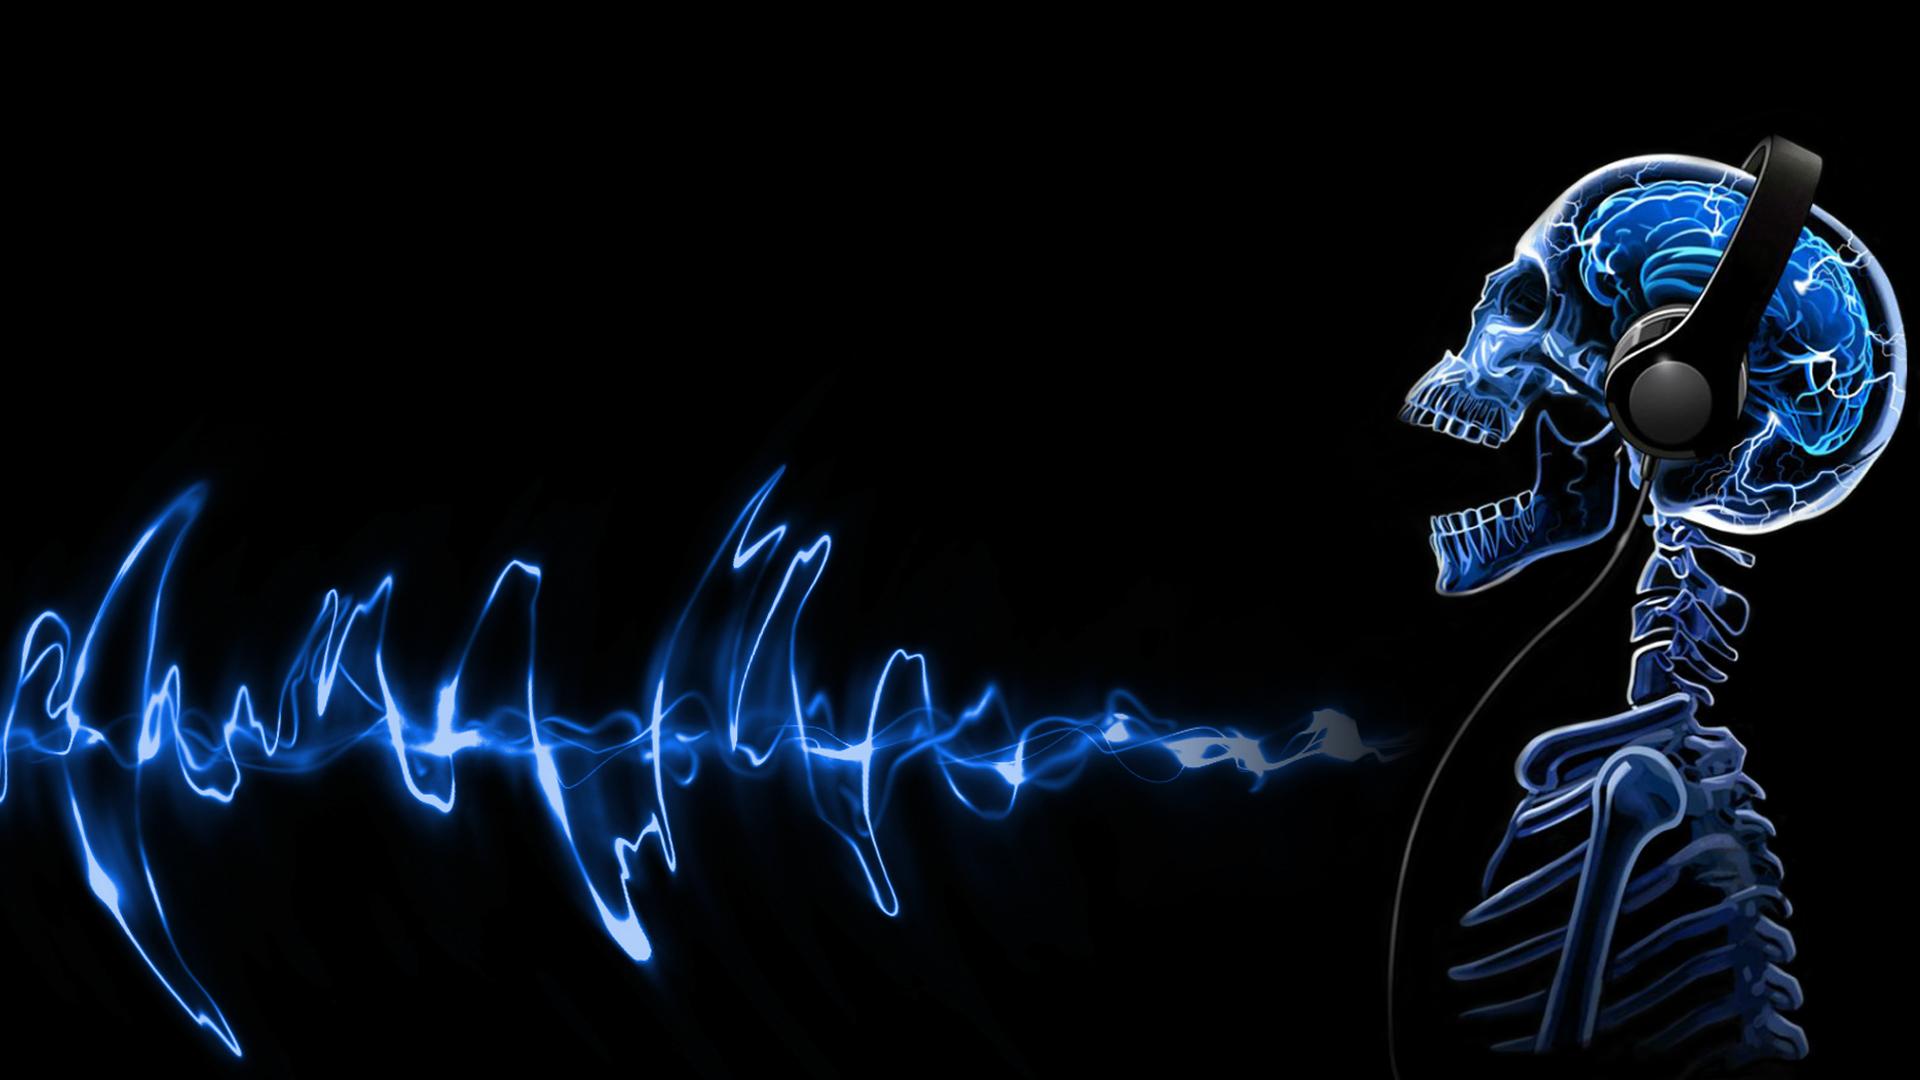 графика dubstep музыка  № 2880920 бесплатно